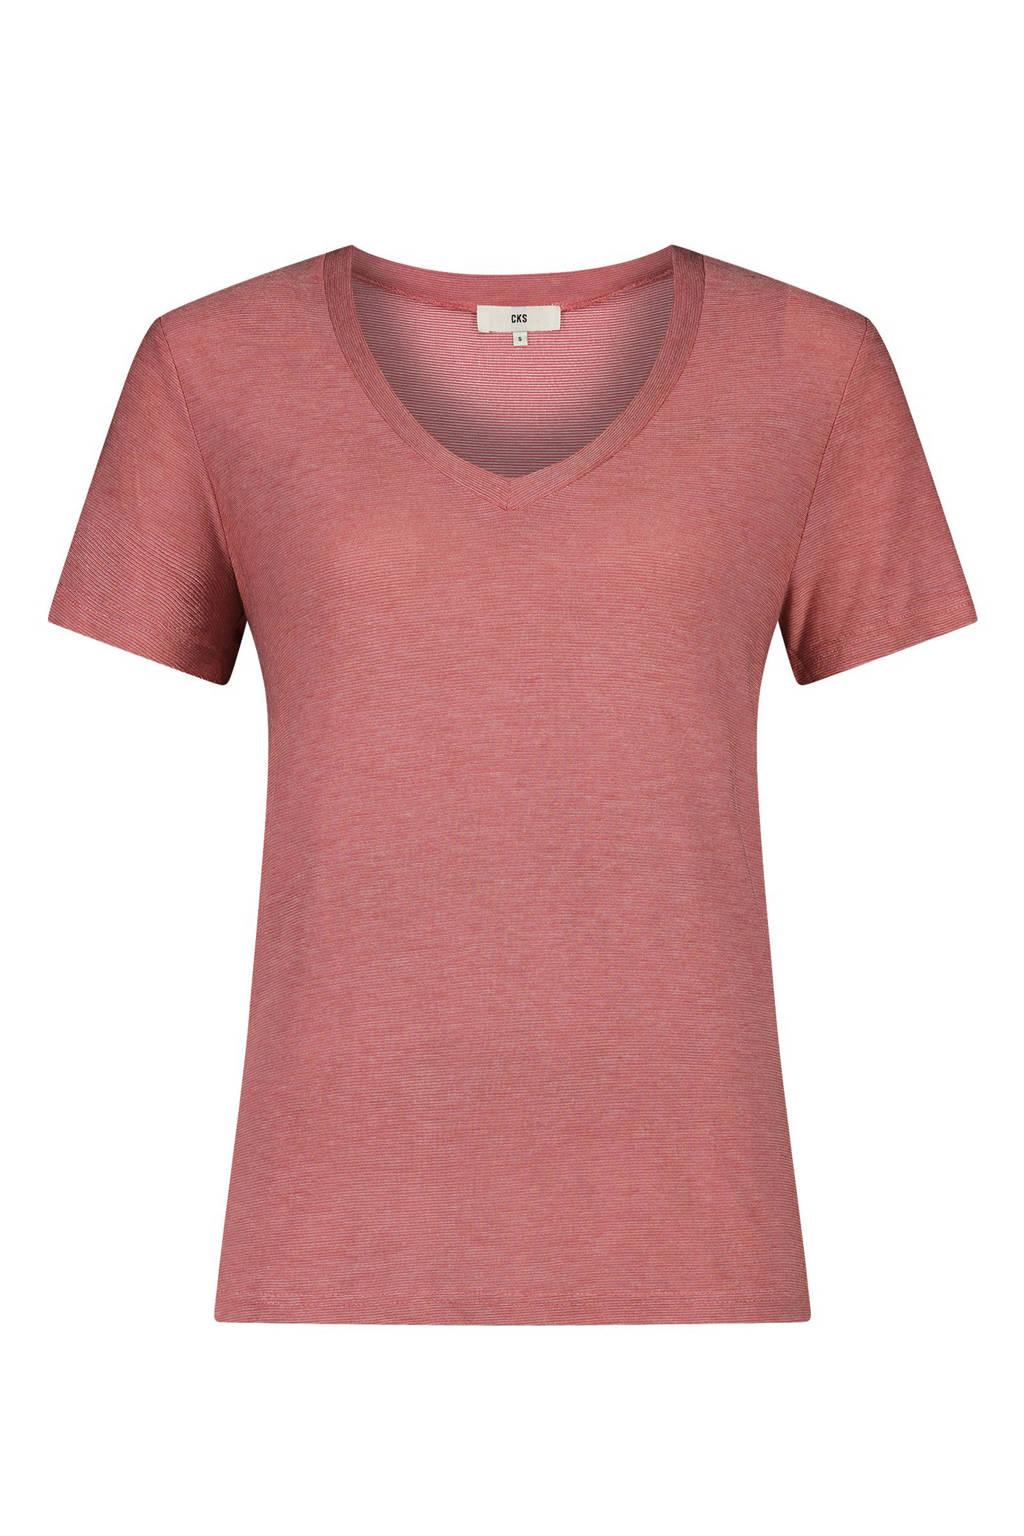 CKS Ebony T-shirt oudroze, Roodbruin